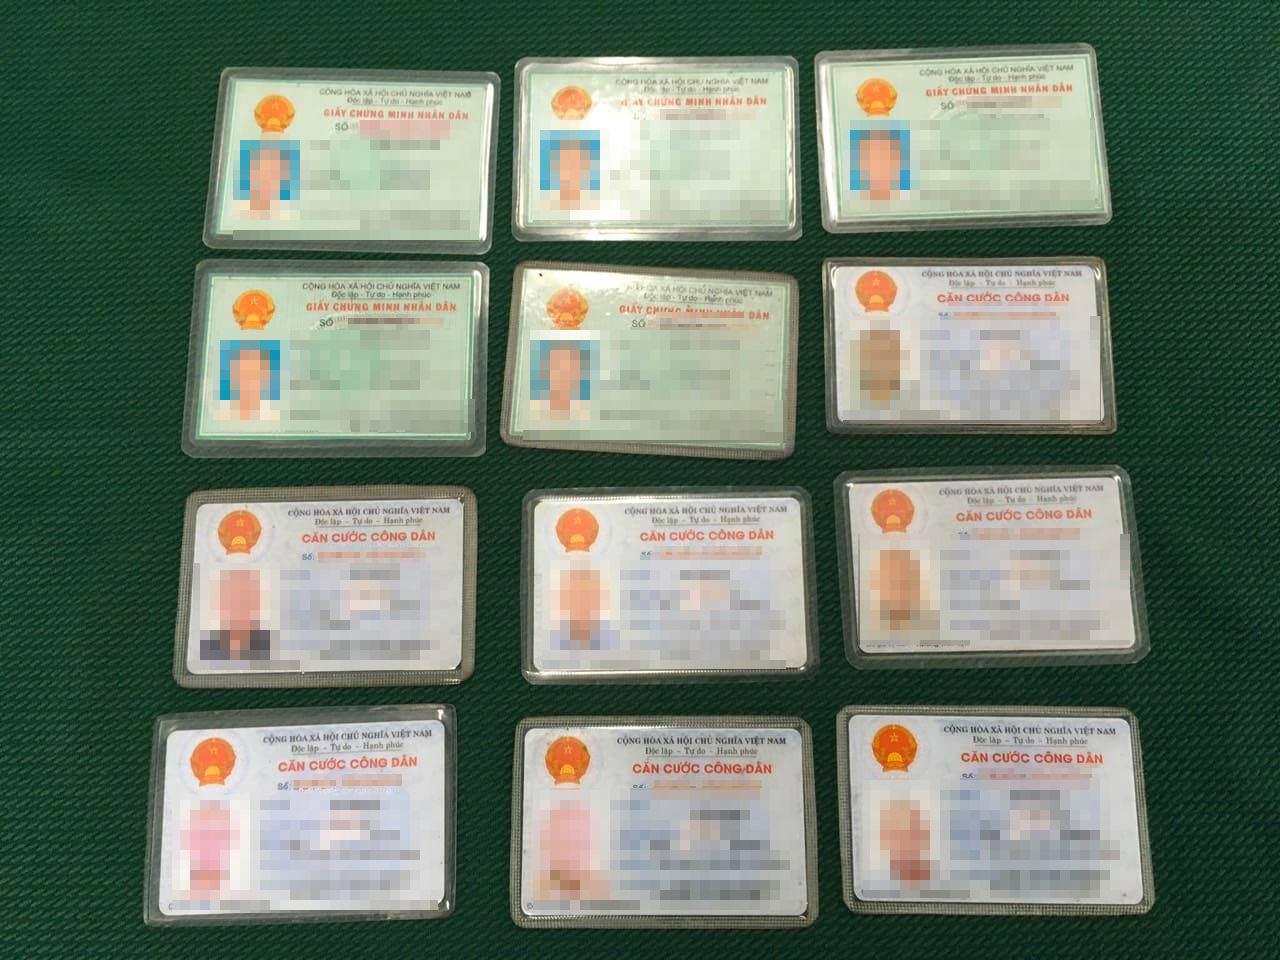 Saigon 'beggar' found with 12 ID cards